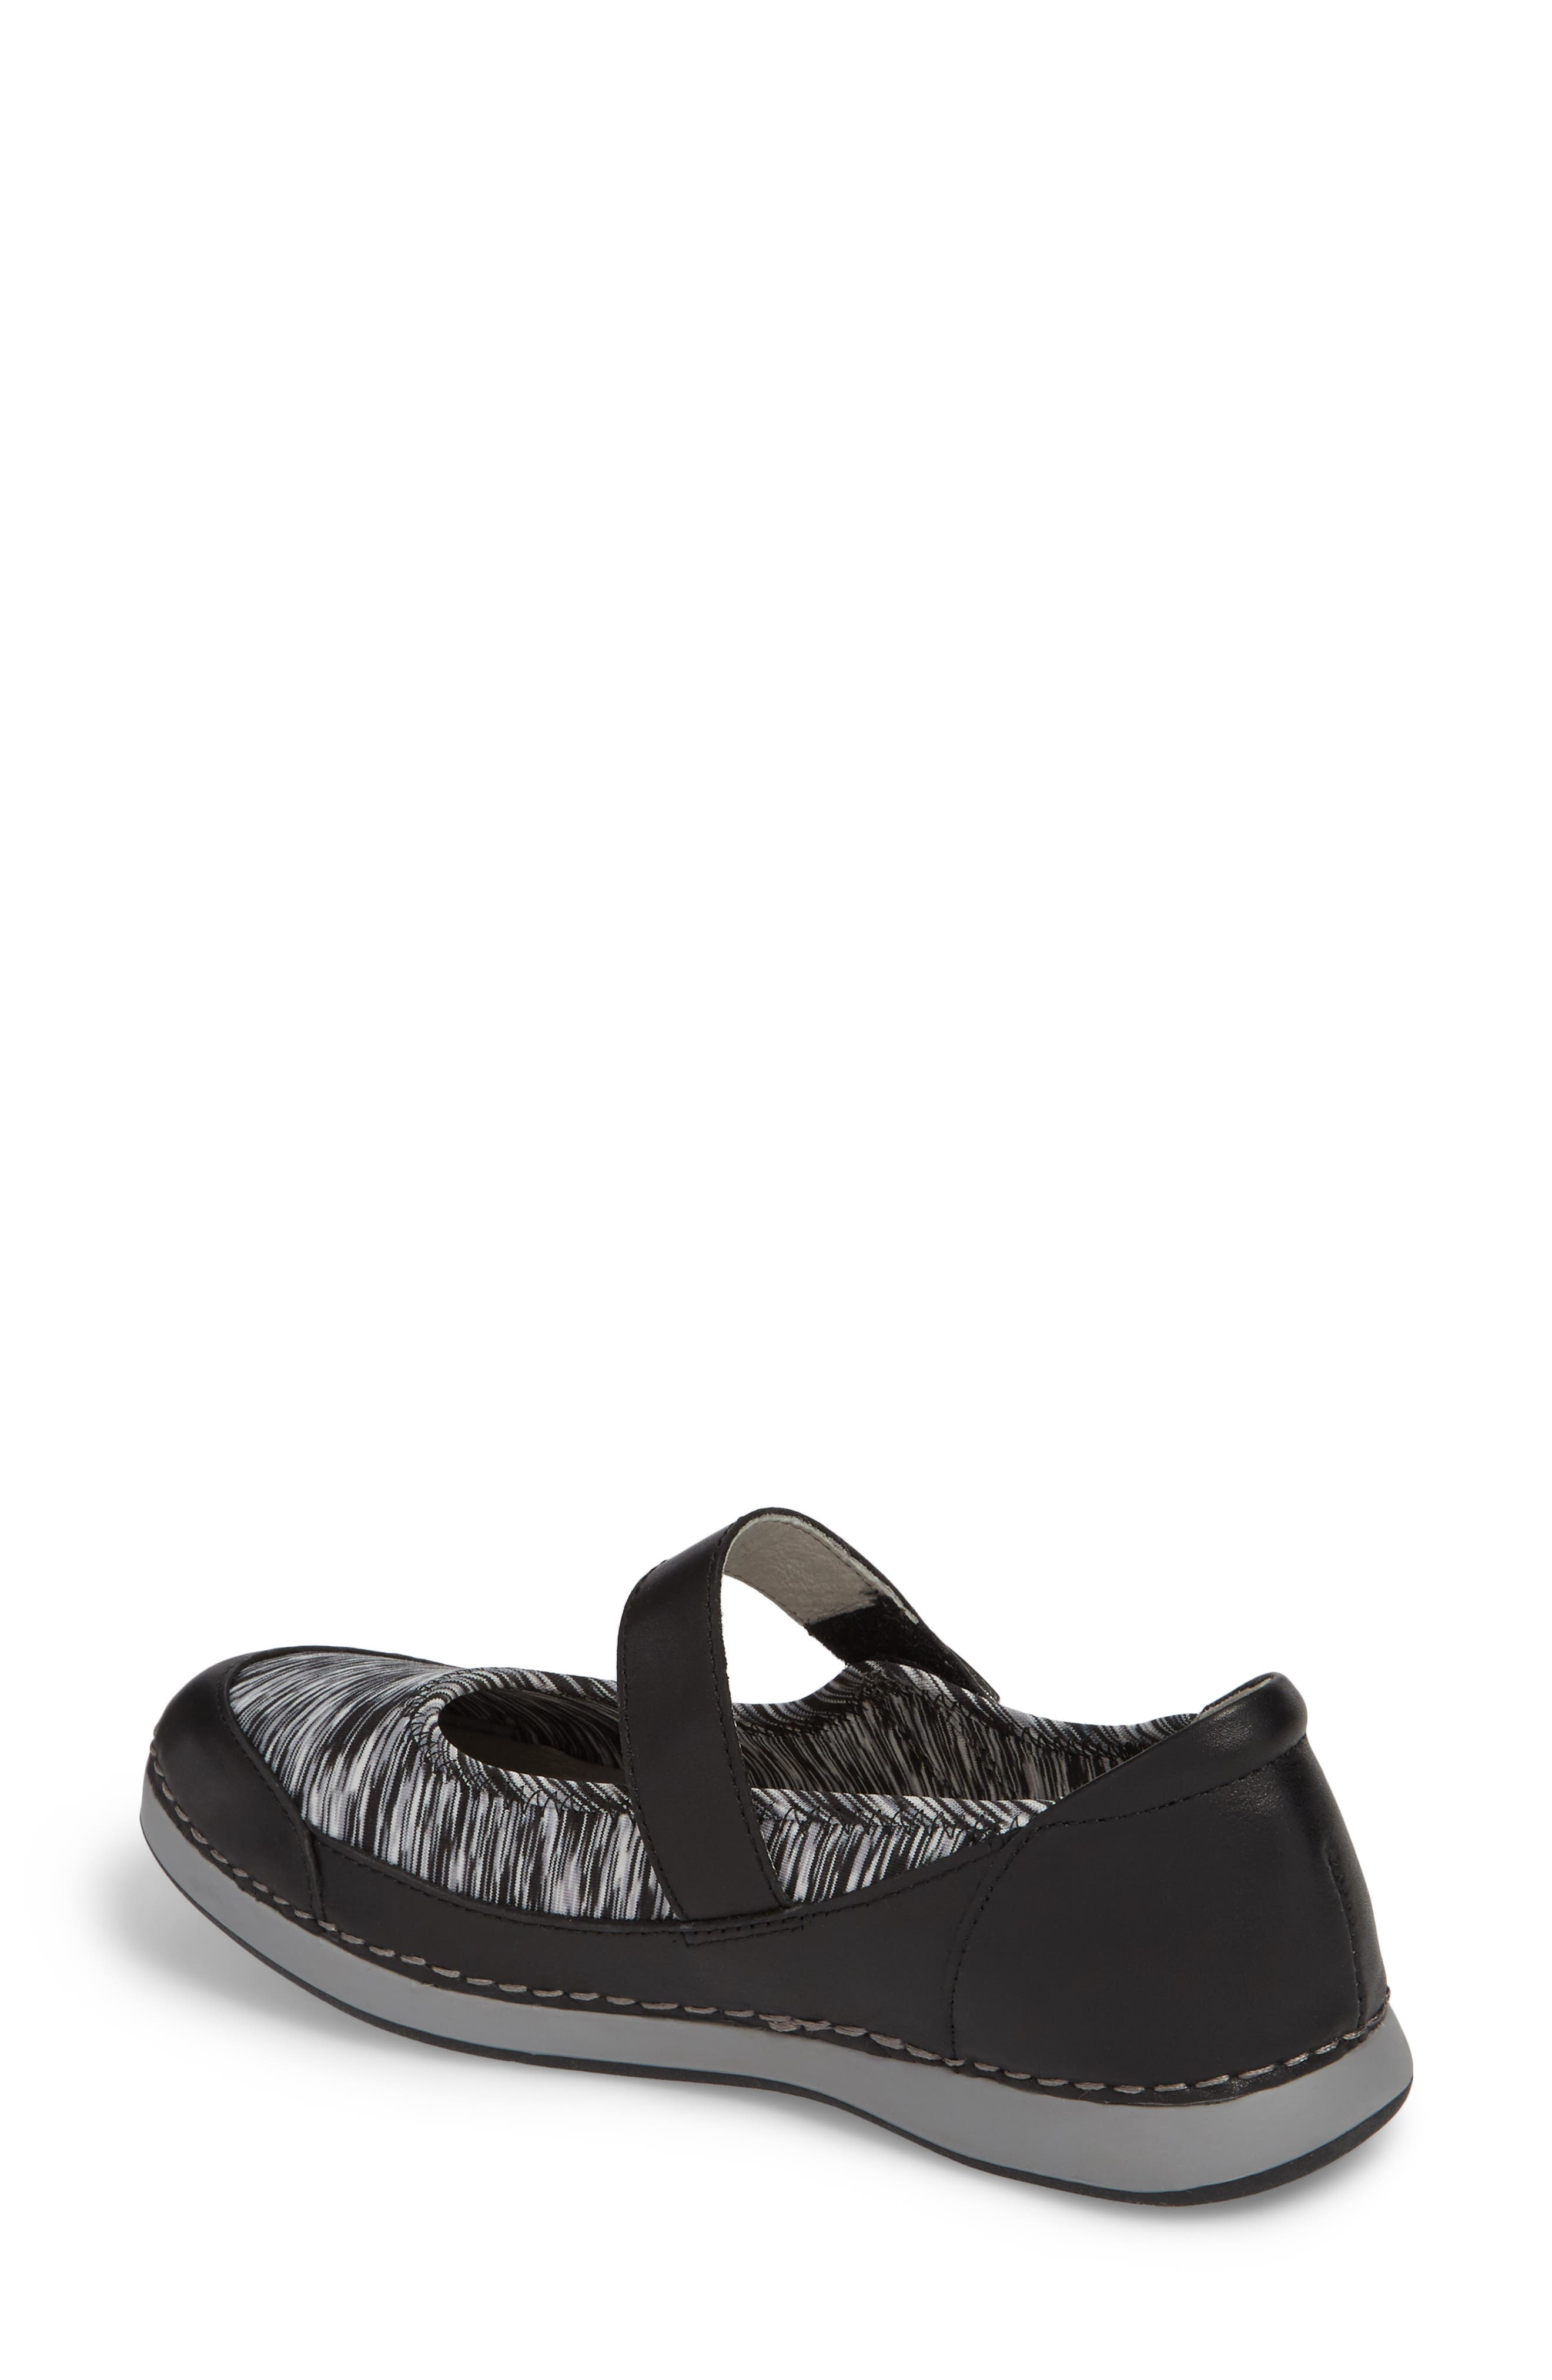 Gem Mary Jane Flat,                             Alternate thumbnail 2, color,                             Black Leather